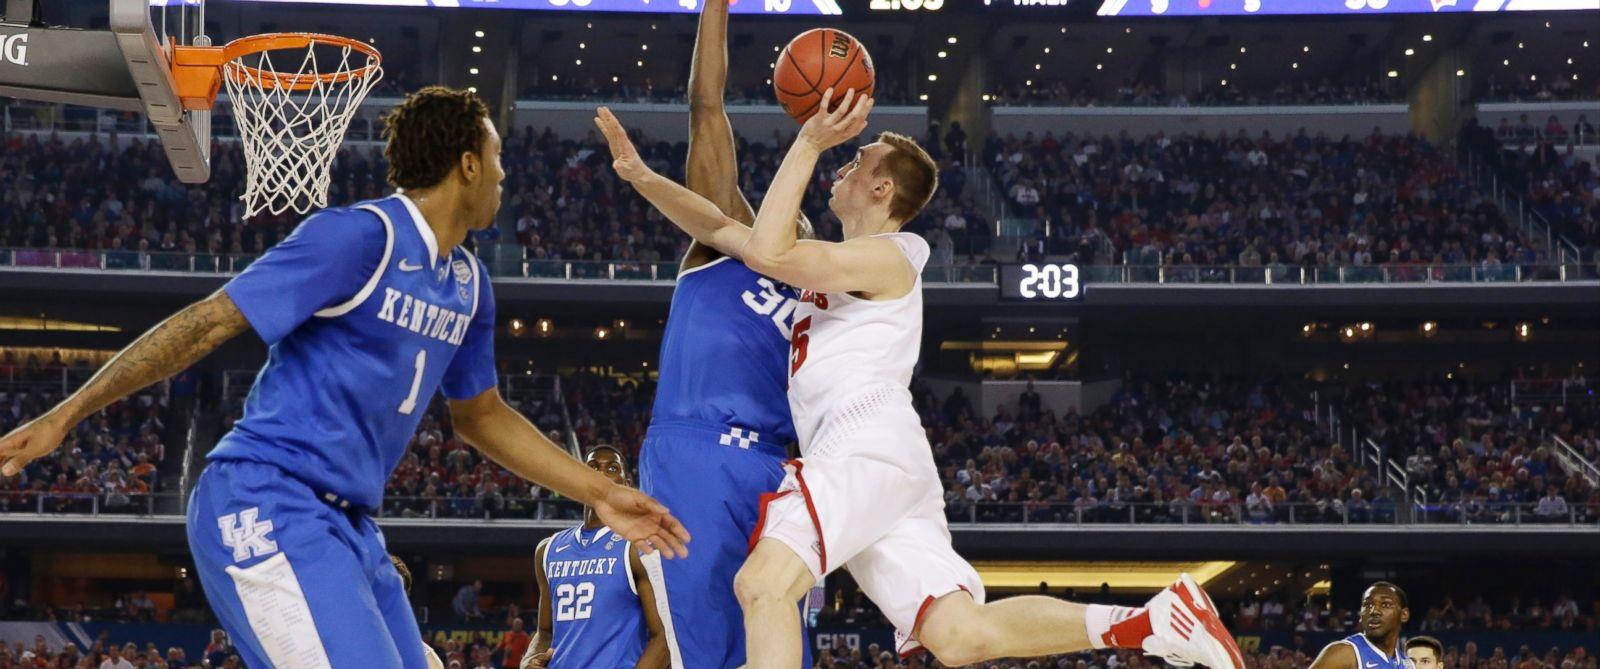 PHOTO: Wisconsin forward Sam Dekker (15) shoots against Kentucky forward Julius Randle (30) during the first half of the NCAA Final Four tournament college basketball semifinal game Saturday, April 5, 2014, in Arlington, Texas.